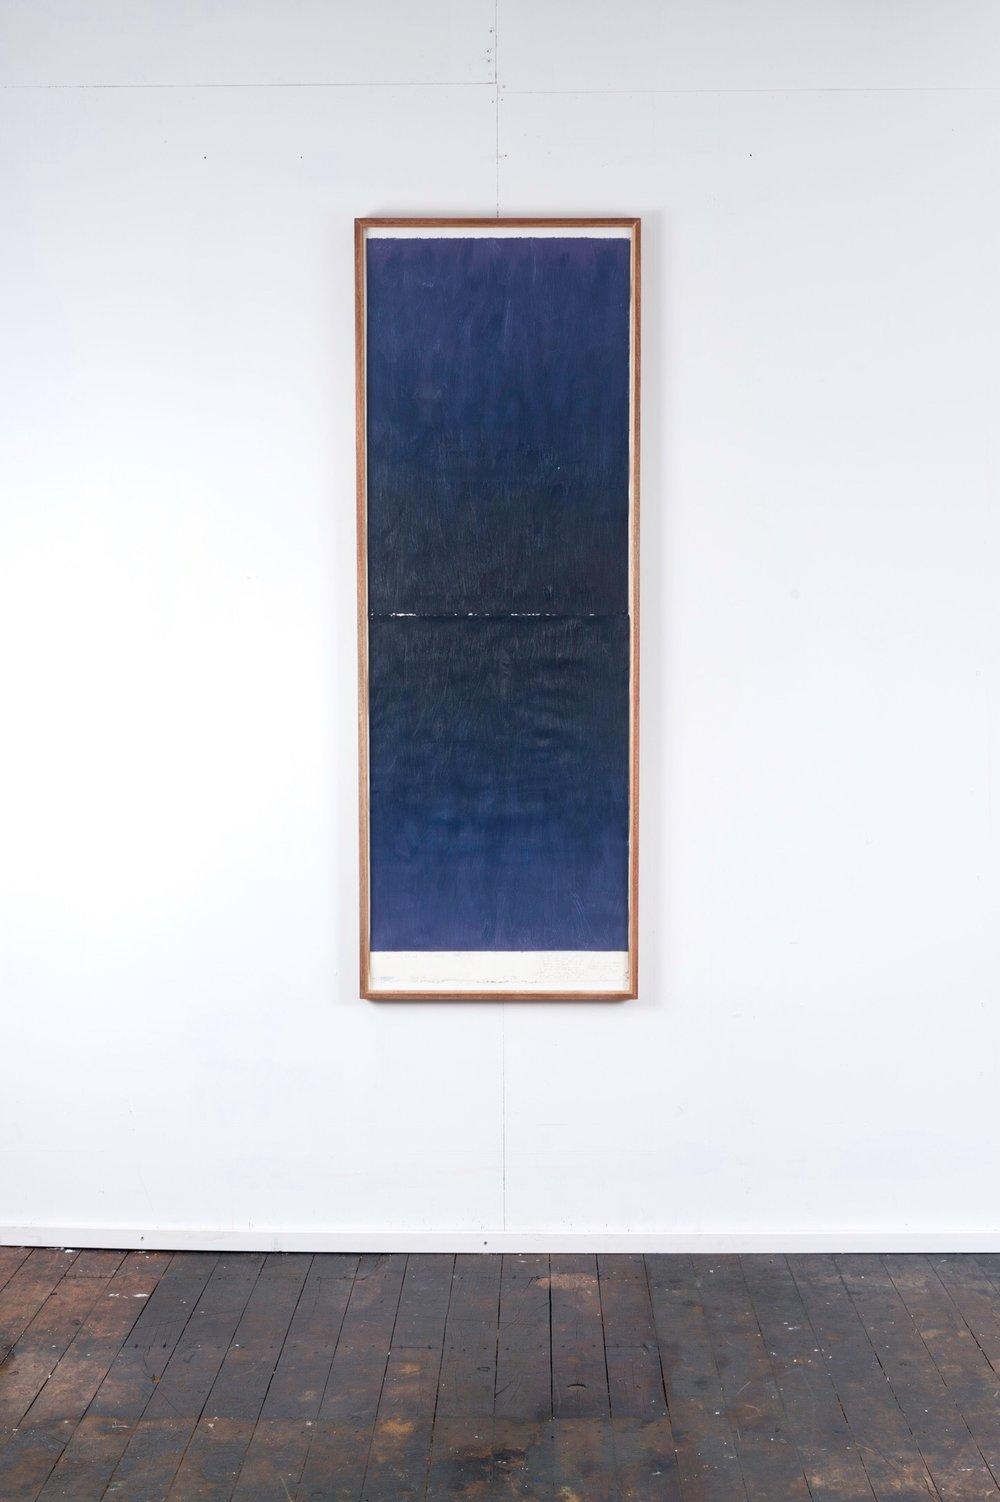 RH 264 Downtown, LA (2317 28021216) , 2016  oil paint, synthetic polymer, marble dust, wax, cotton rag paper, Tasmanian Oak, Museum glass  161 x 58 x 4 cm